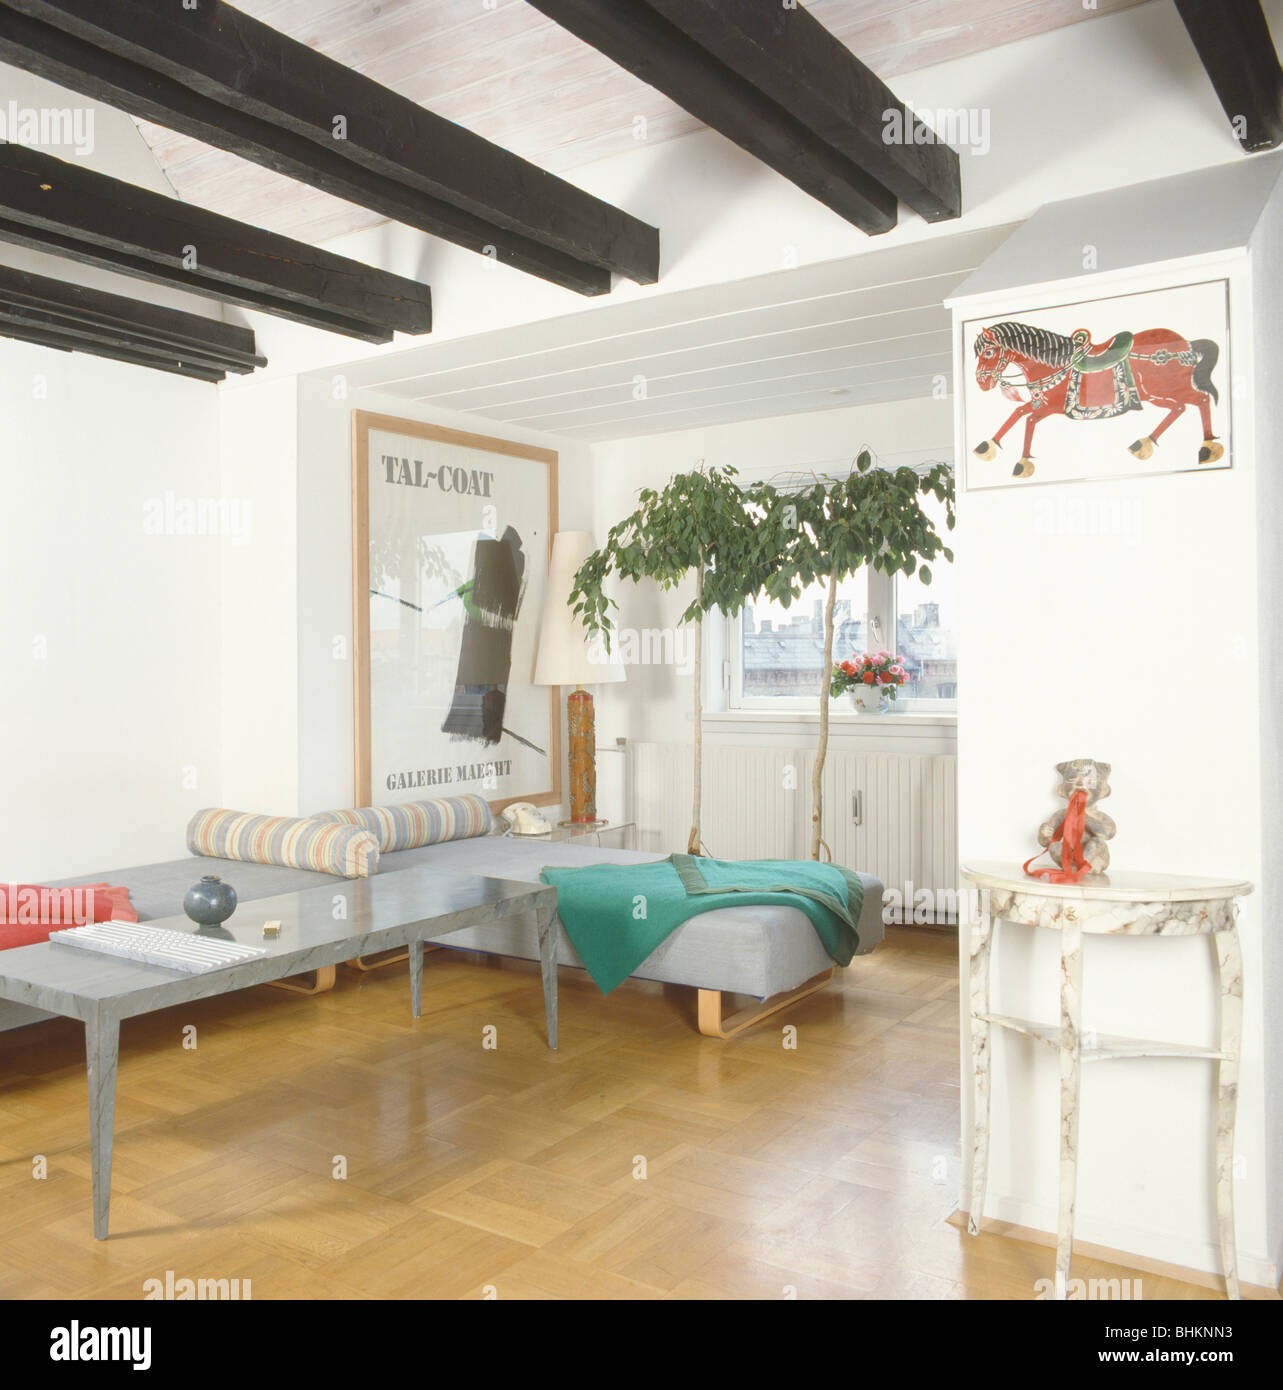 Woodblock flooring and black ceiling beams in small loft conversion ...